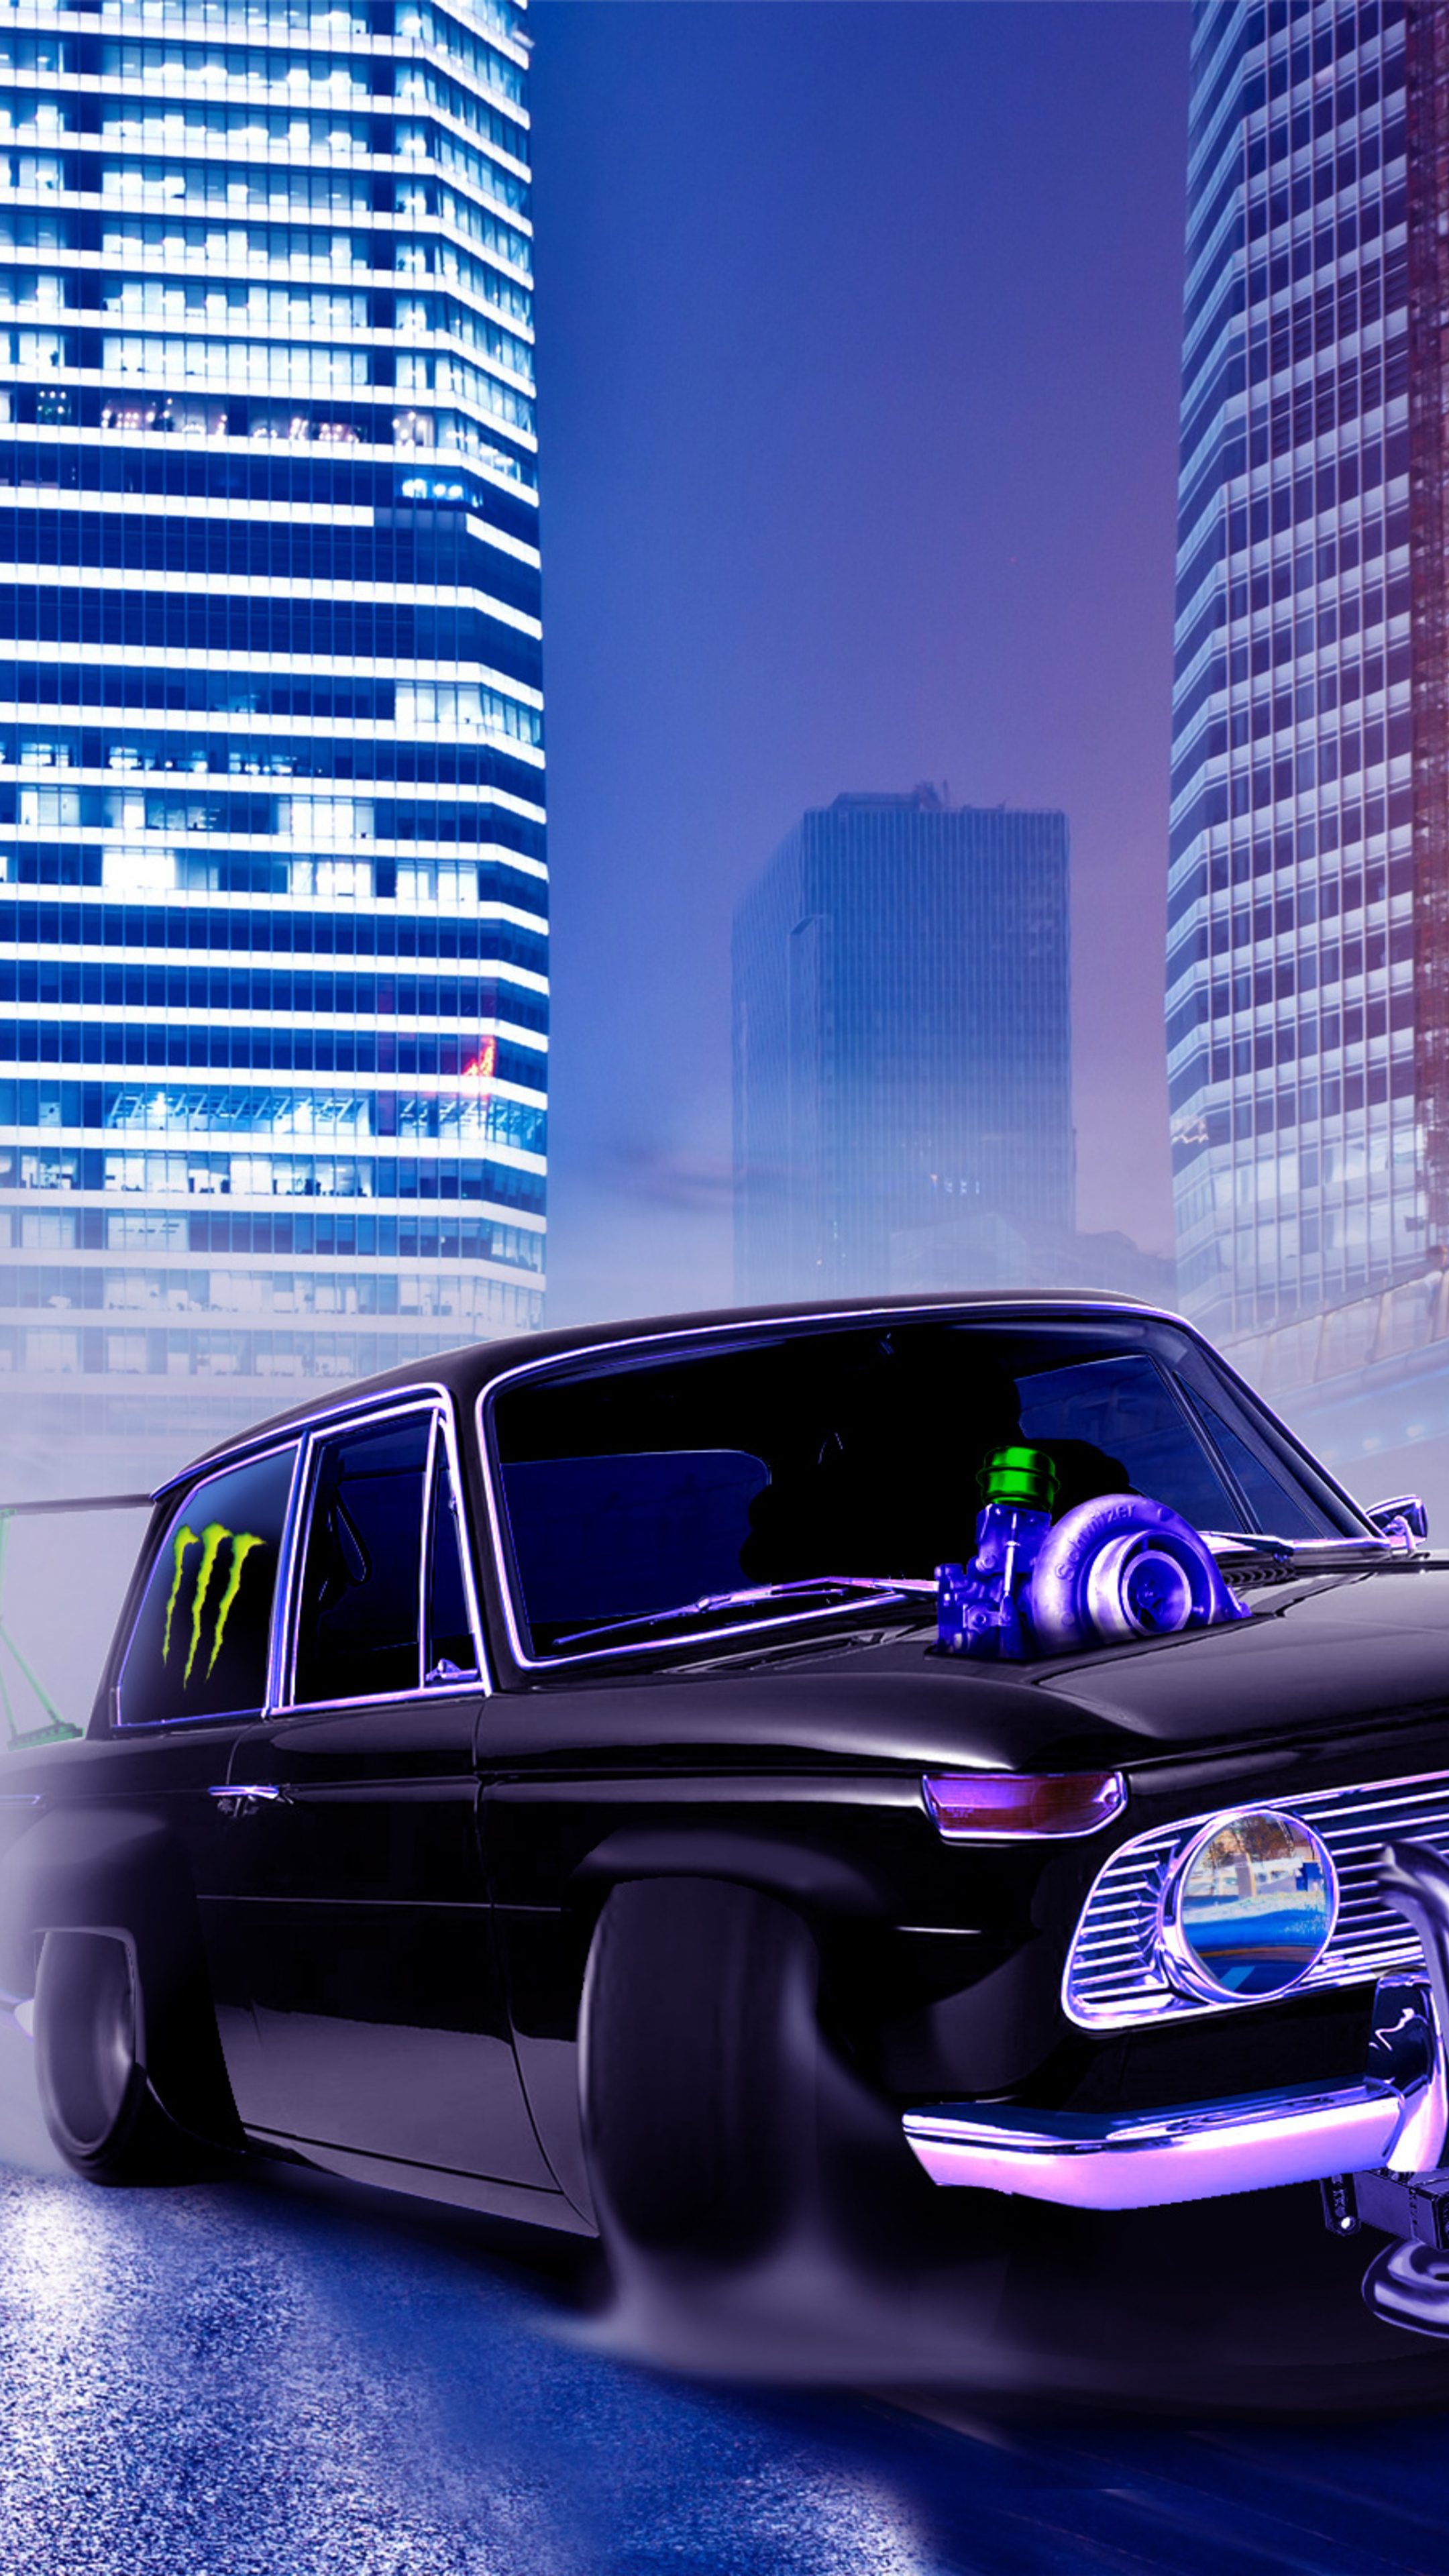 bmw-drifting-in-the-city-90.jpg